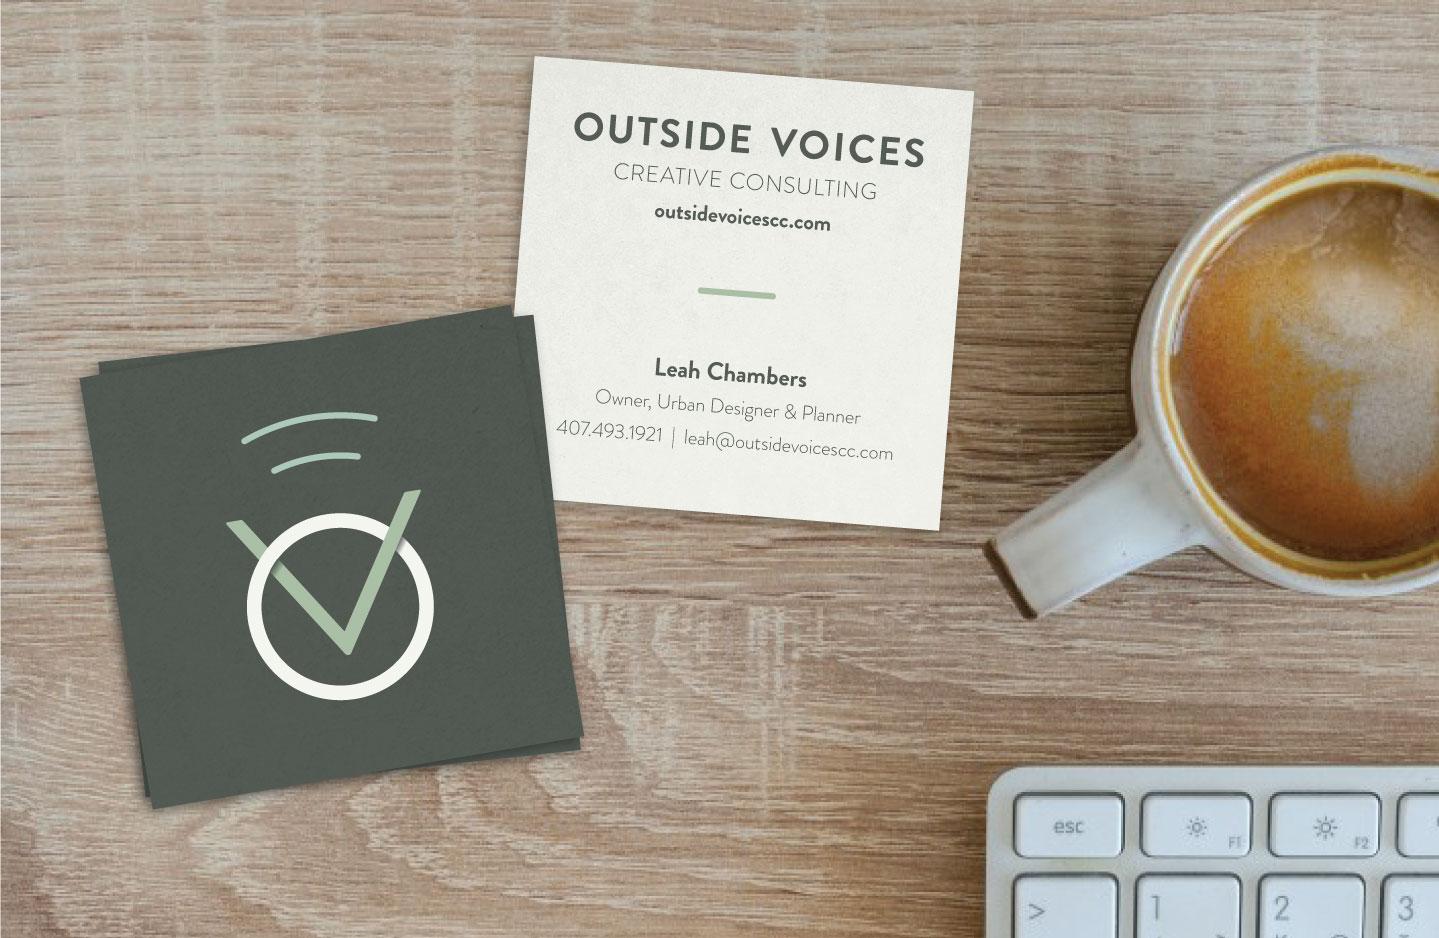 Outside_Voices_CC-Branding_Finals.jpg